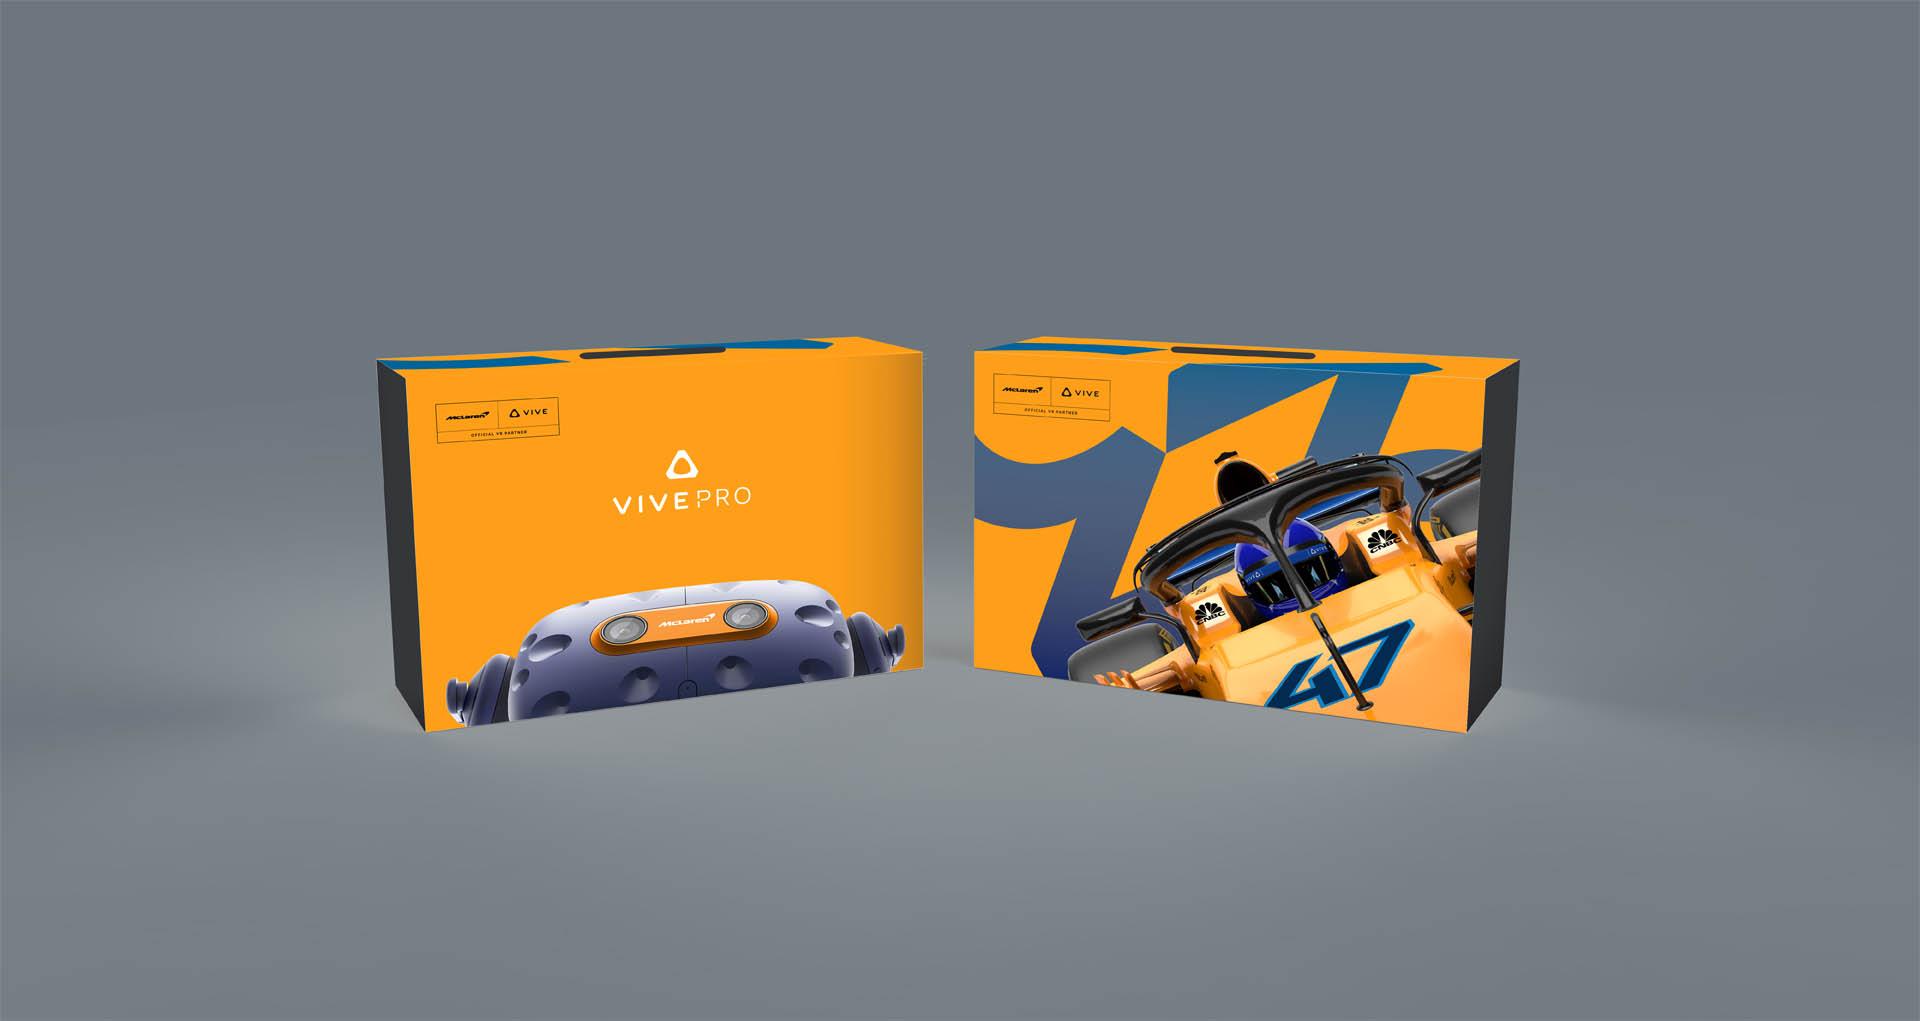 VIVE Pro MacLaren Limited Edition_HMD